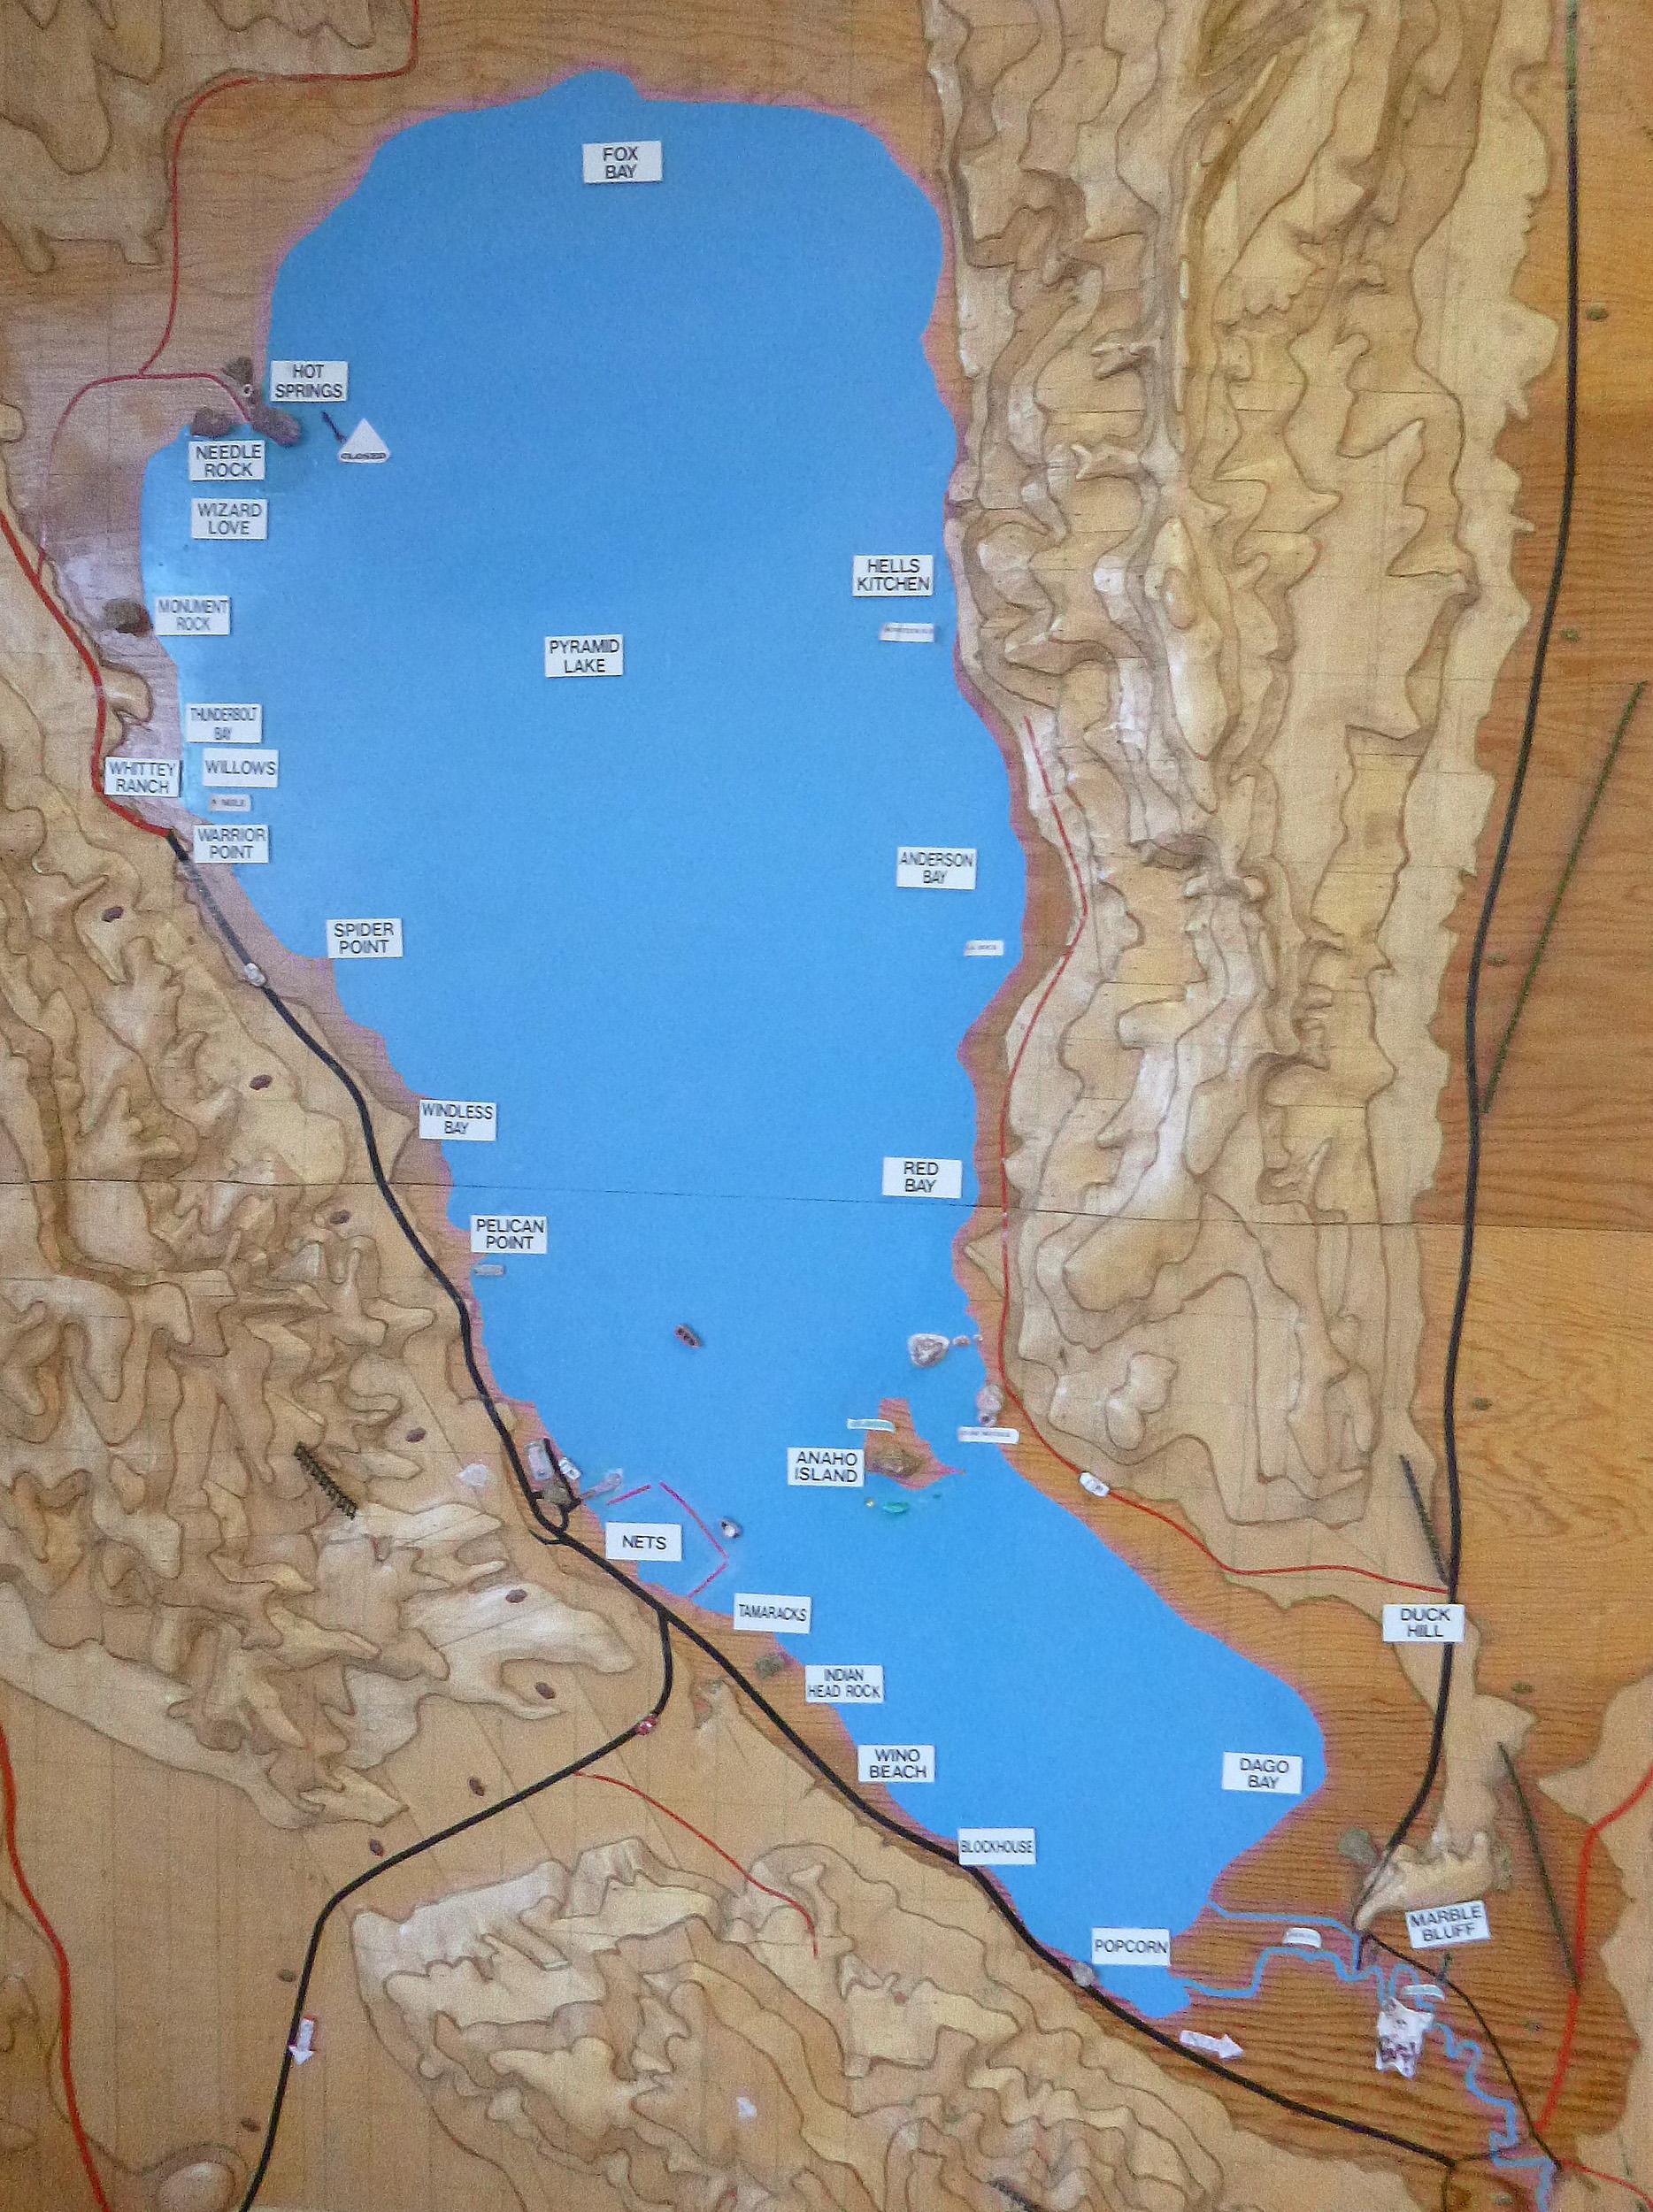 The Summit Reno >> Pyramid Lake, Nevada – Dec. 20 – 22, 2014 | BelieveSteve (StevenRichardMiller)